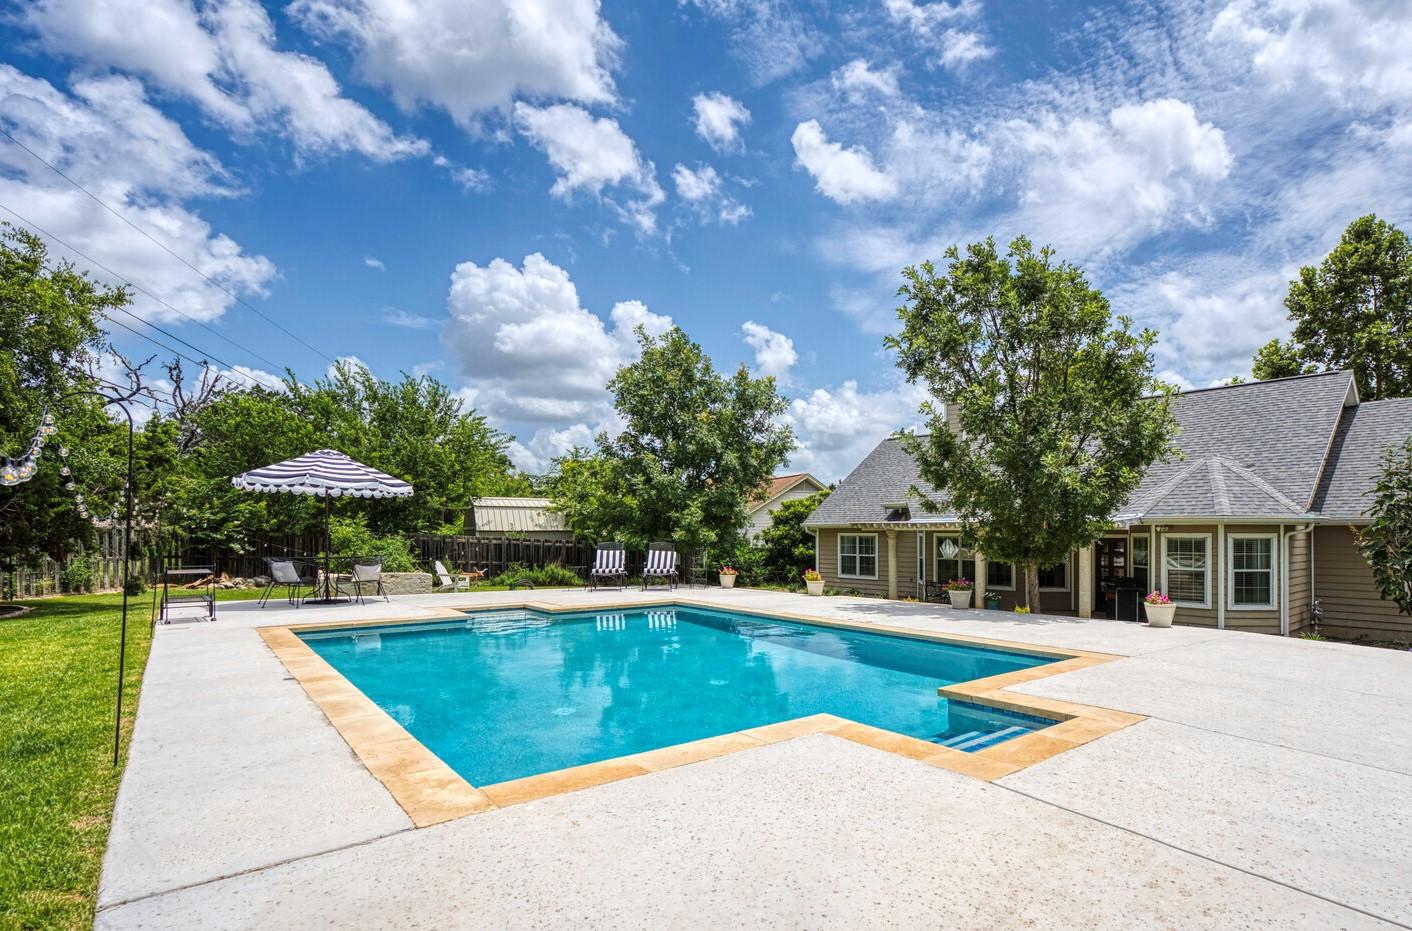 1803 White Tail Lane.  Call Gail Stone Realty in Bandera, Texas. 830-796-4640